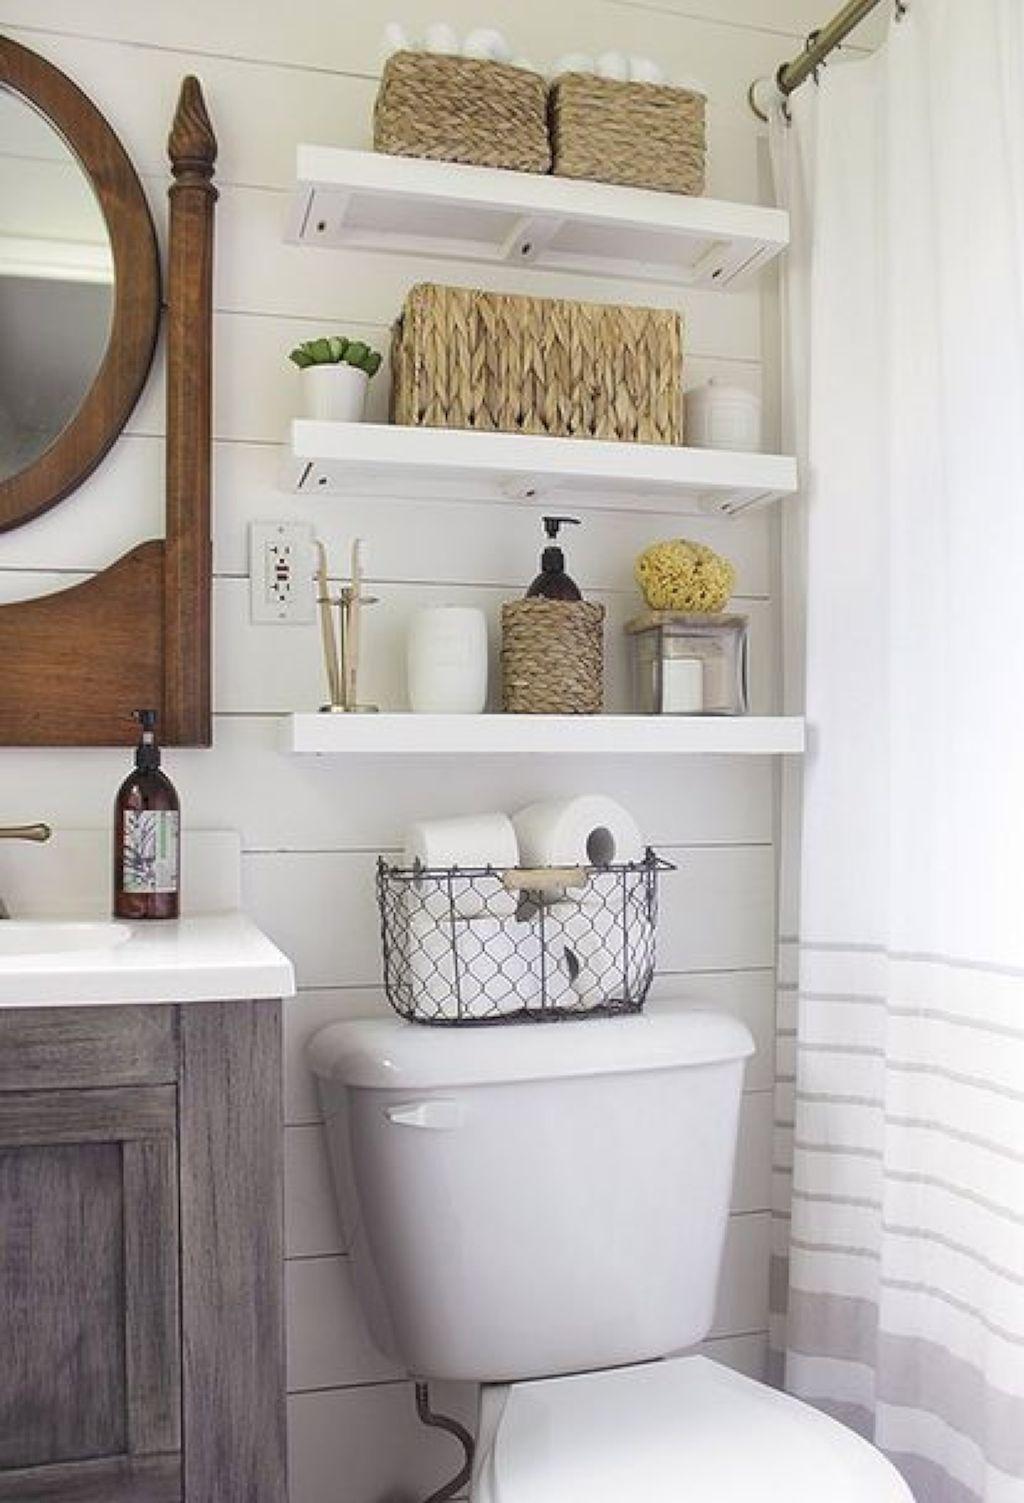 70 Best Small Bathroom Decor and Design Ideas | Pinterest | Small ...